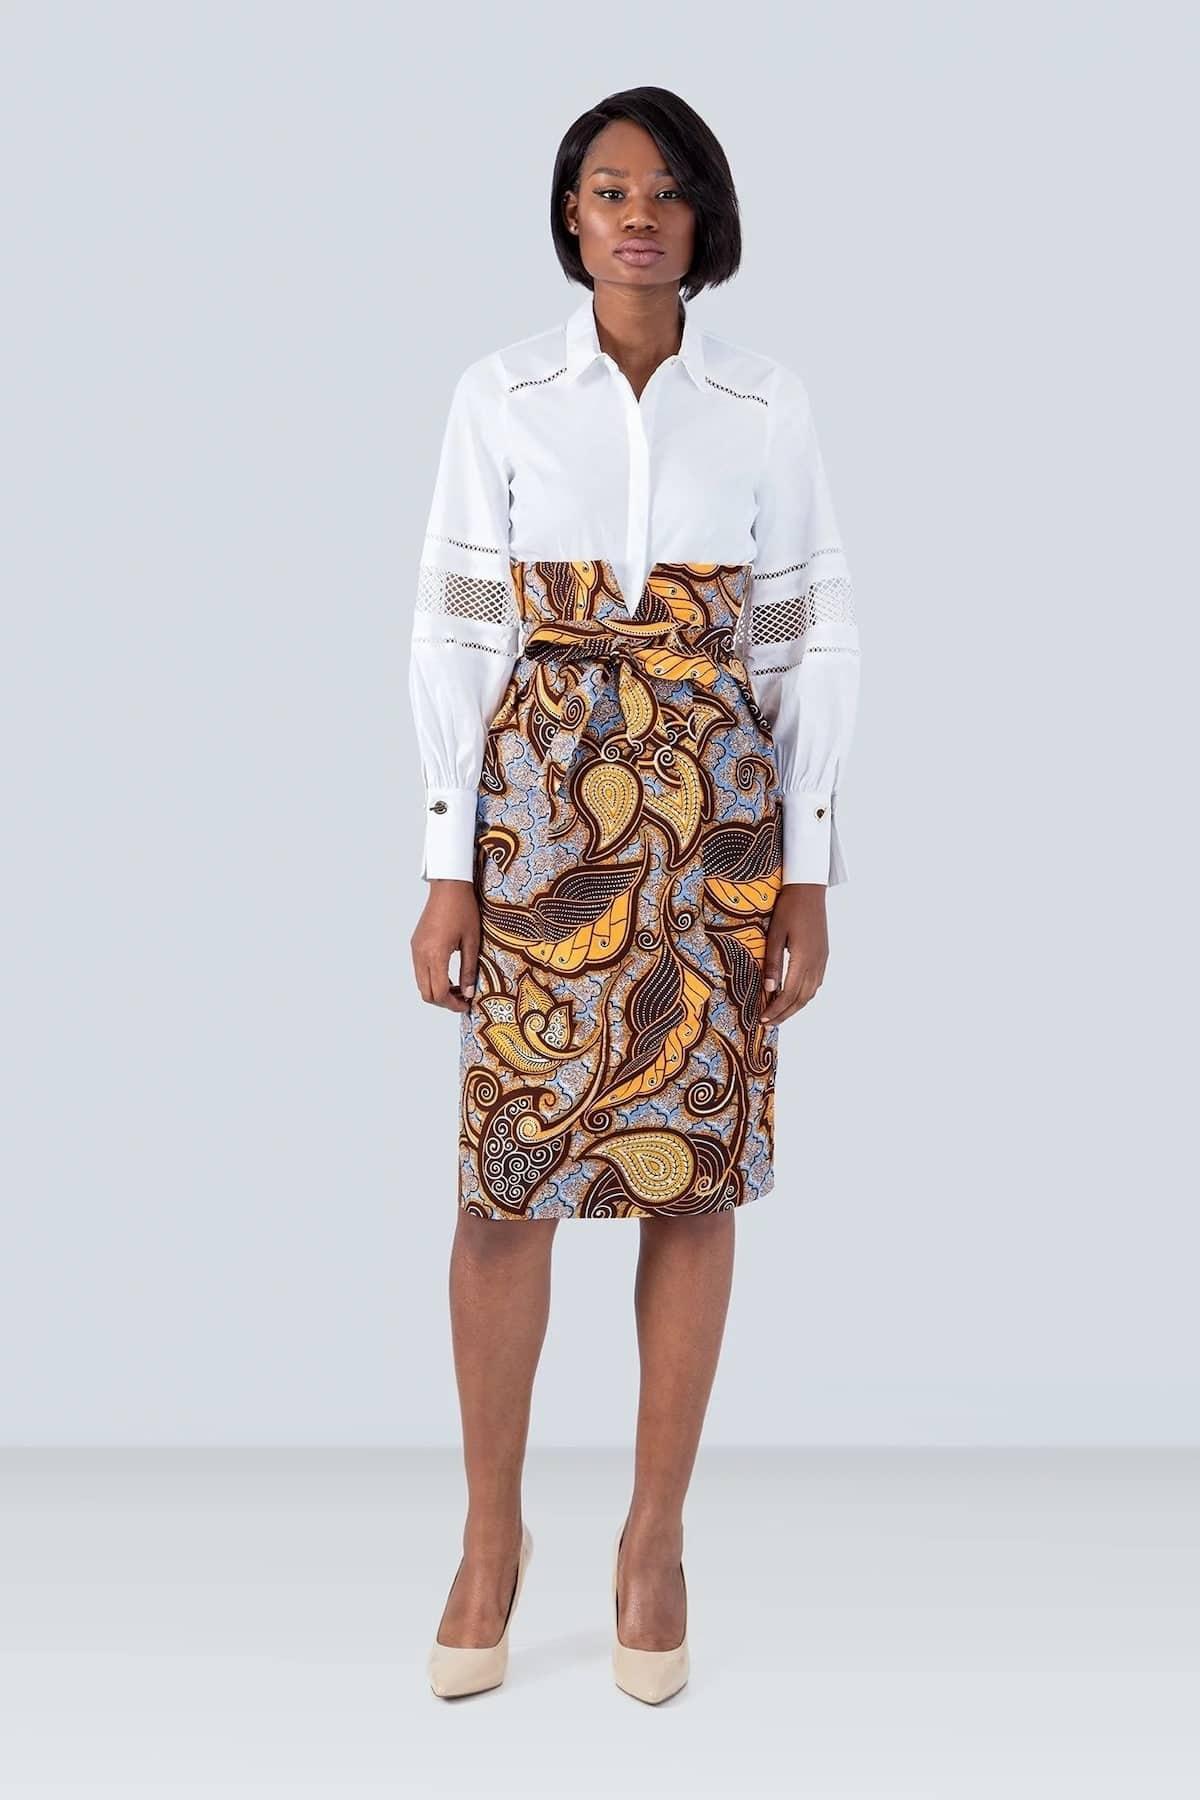 Pencil skirts, Kitenge pencil skirts, Ankara pencil skirts